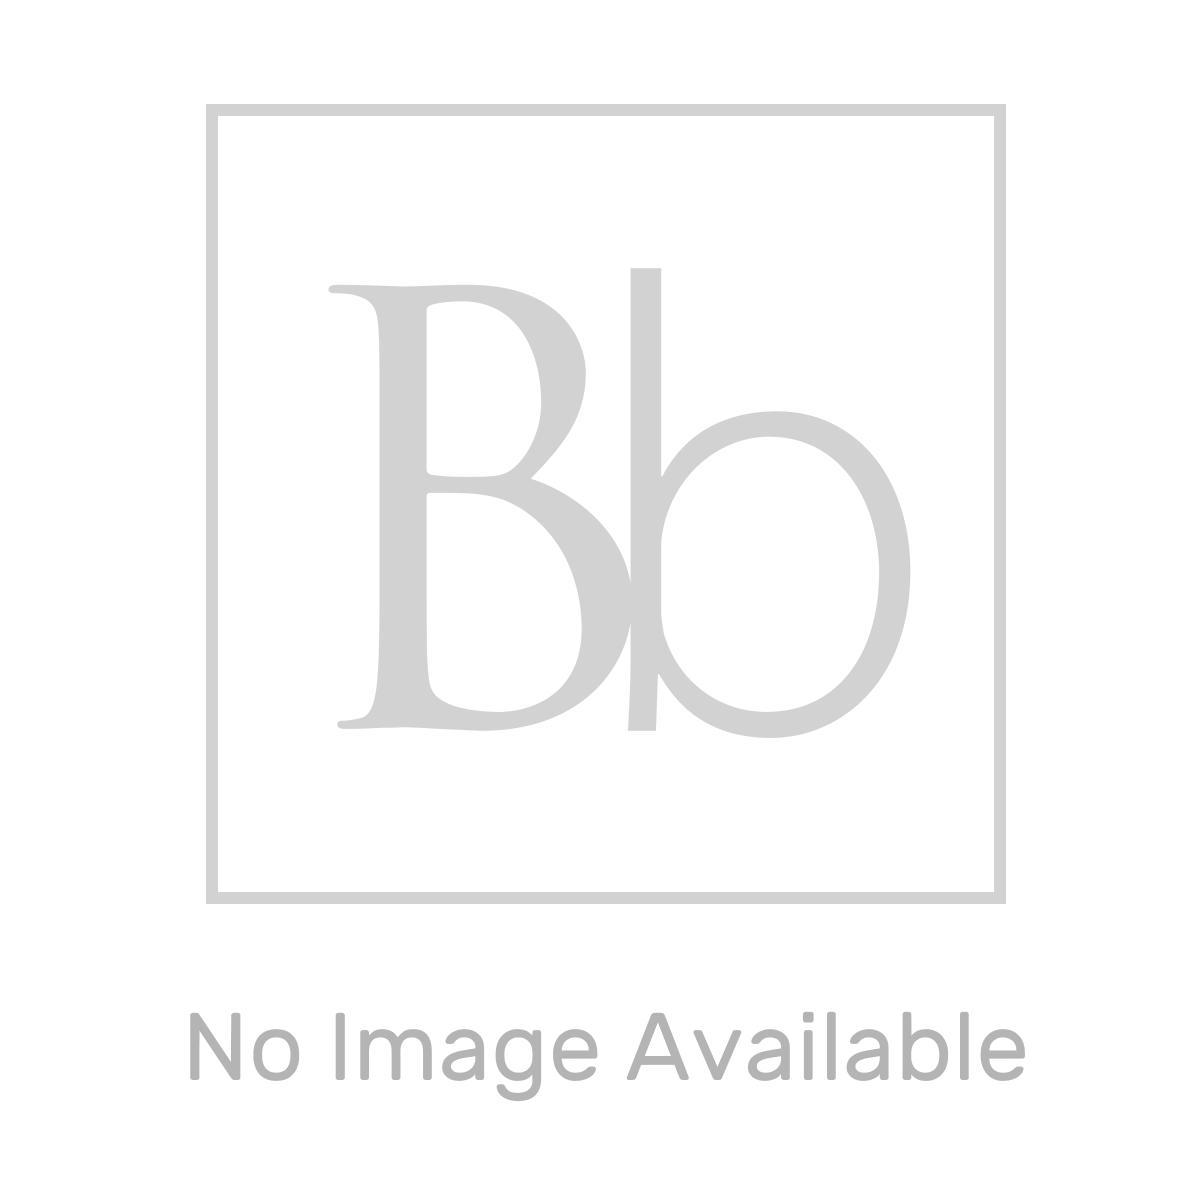 RAK Ecofix Chrome Flush Plate with Surrounded Rectangular Push Buttons Measurements